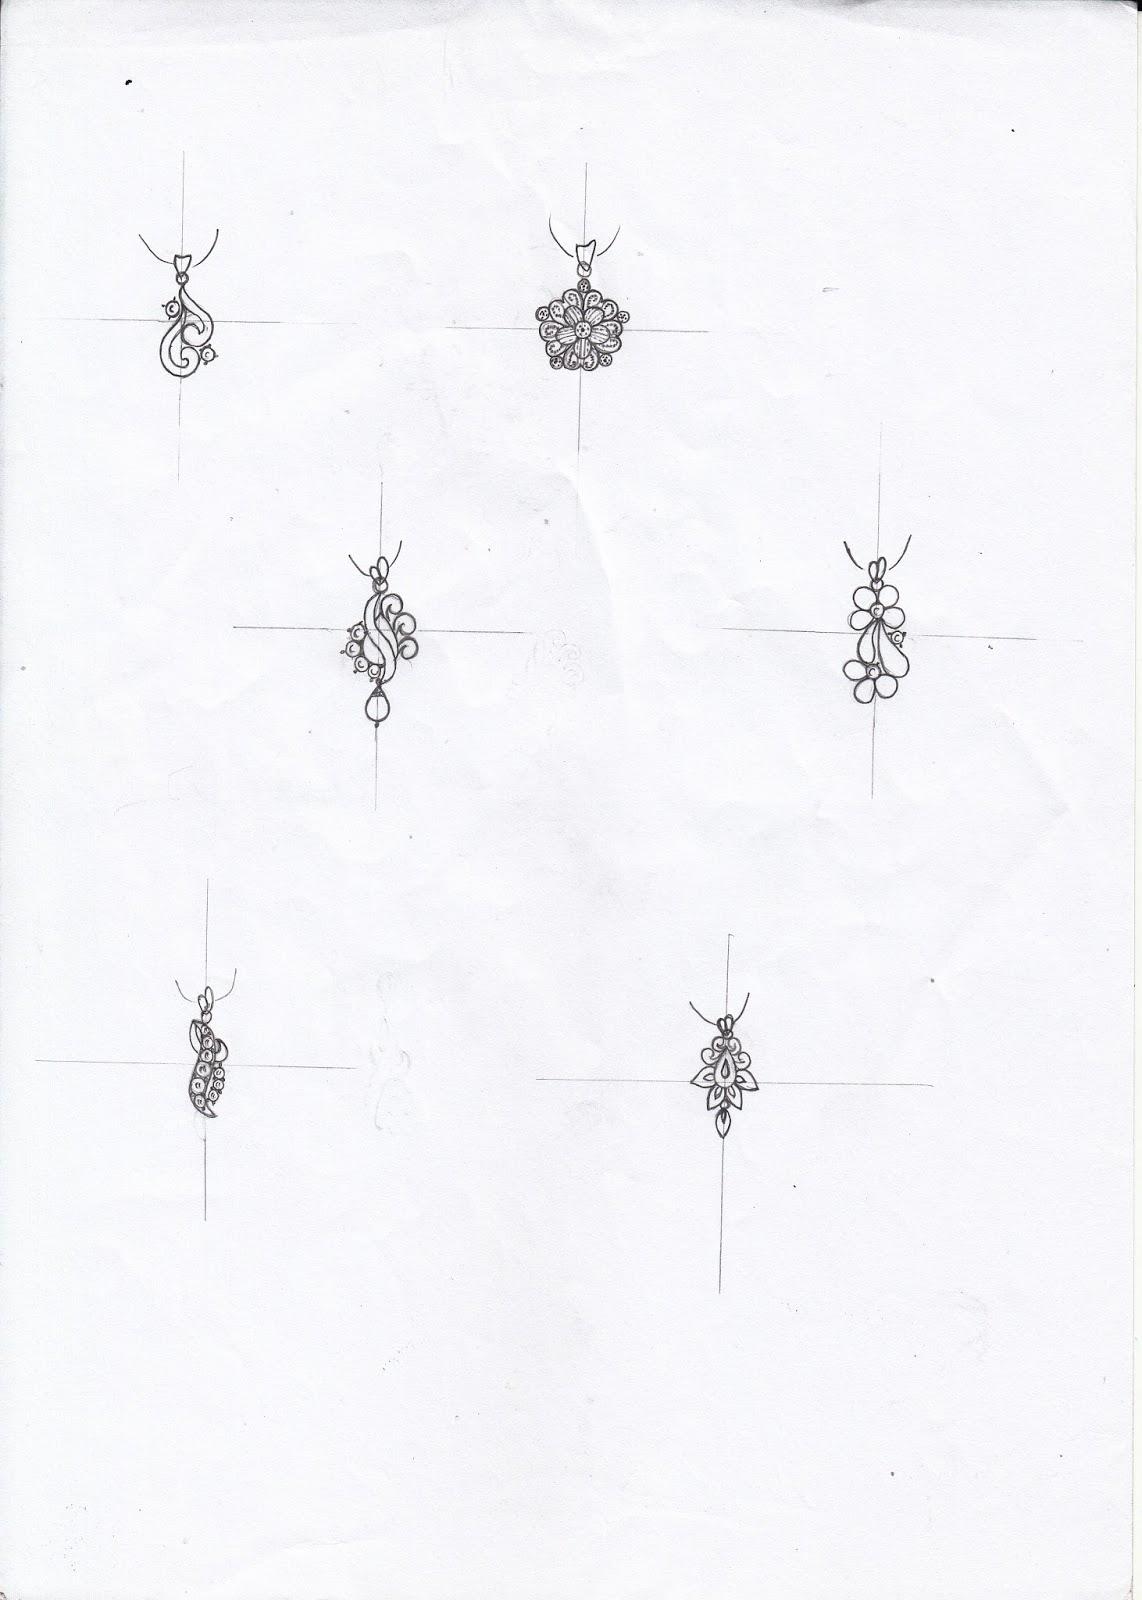 CHENNAI RHINO GOLD JEWELLERY CAD DESIGNING DRAWING TRAINING